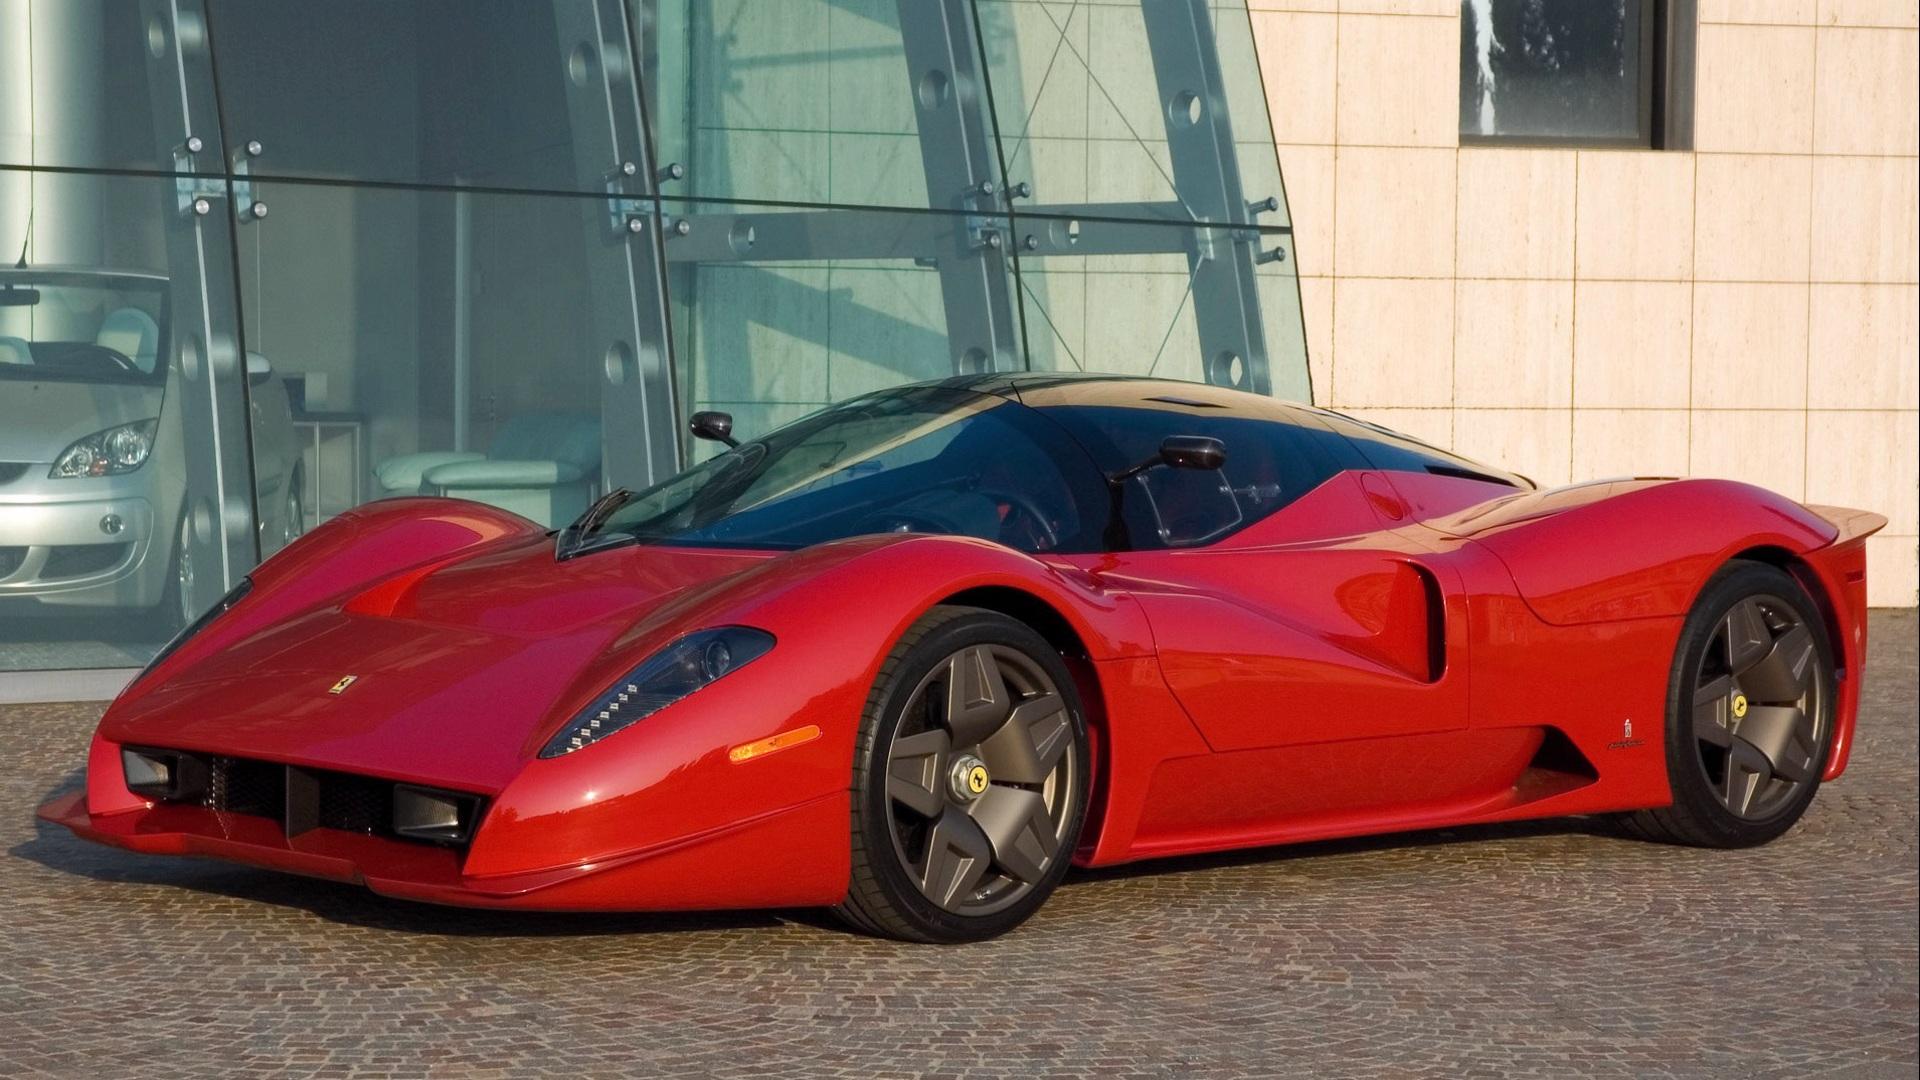 Auto Ferrari Wallpapers